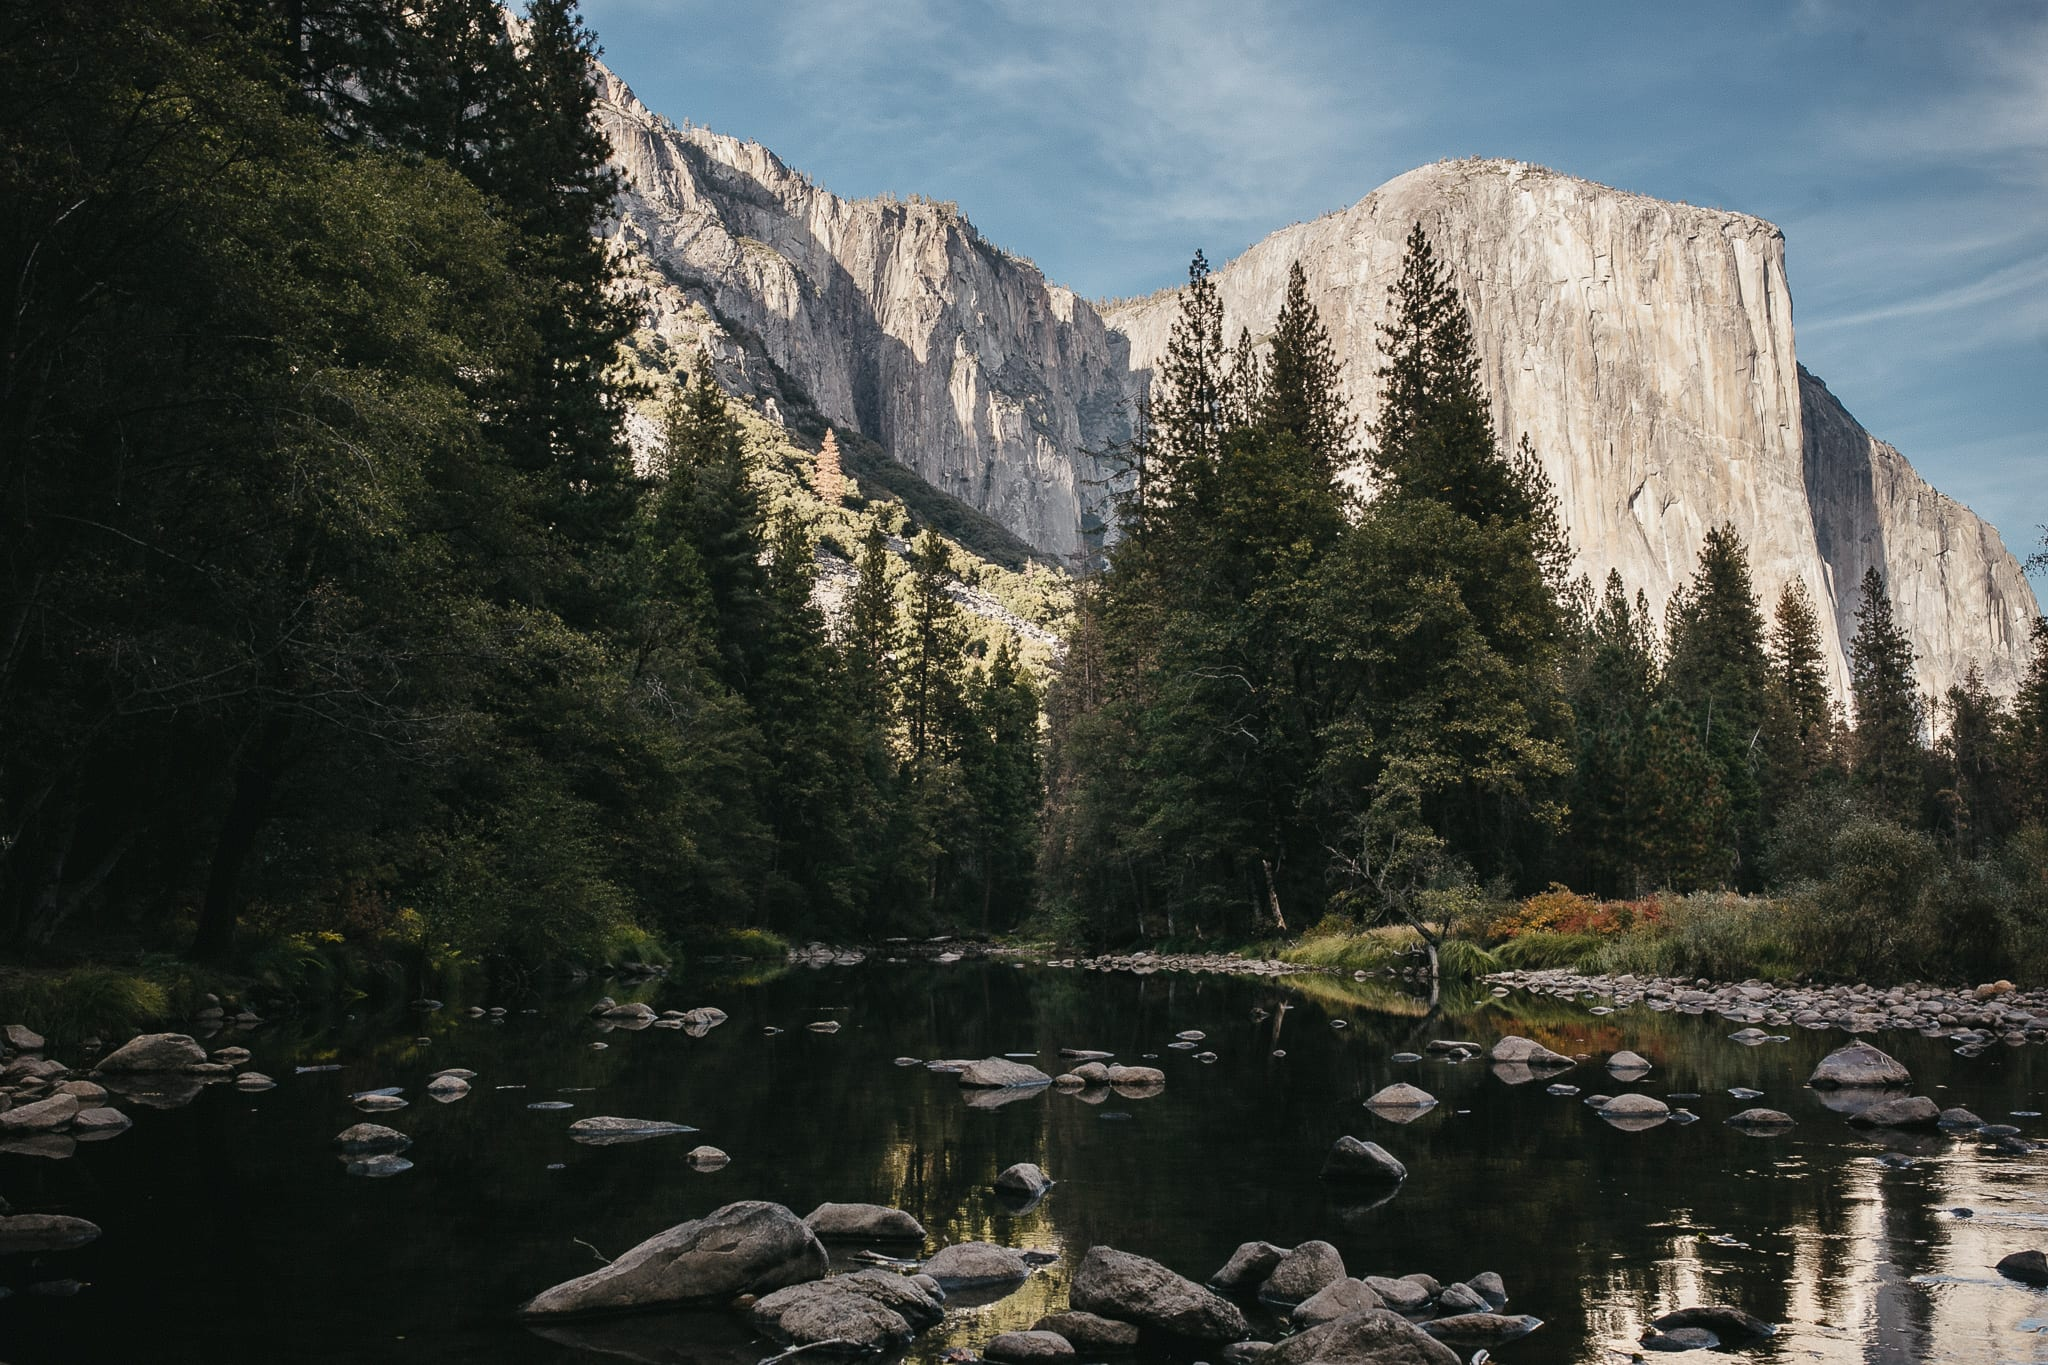 clouds-rest-yosemite-california-engagement-lifestyle-adventure-photographer-33